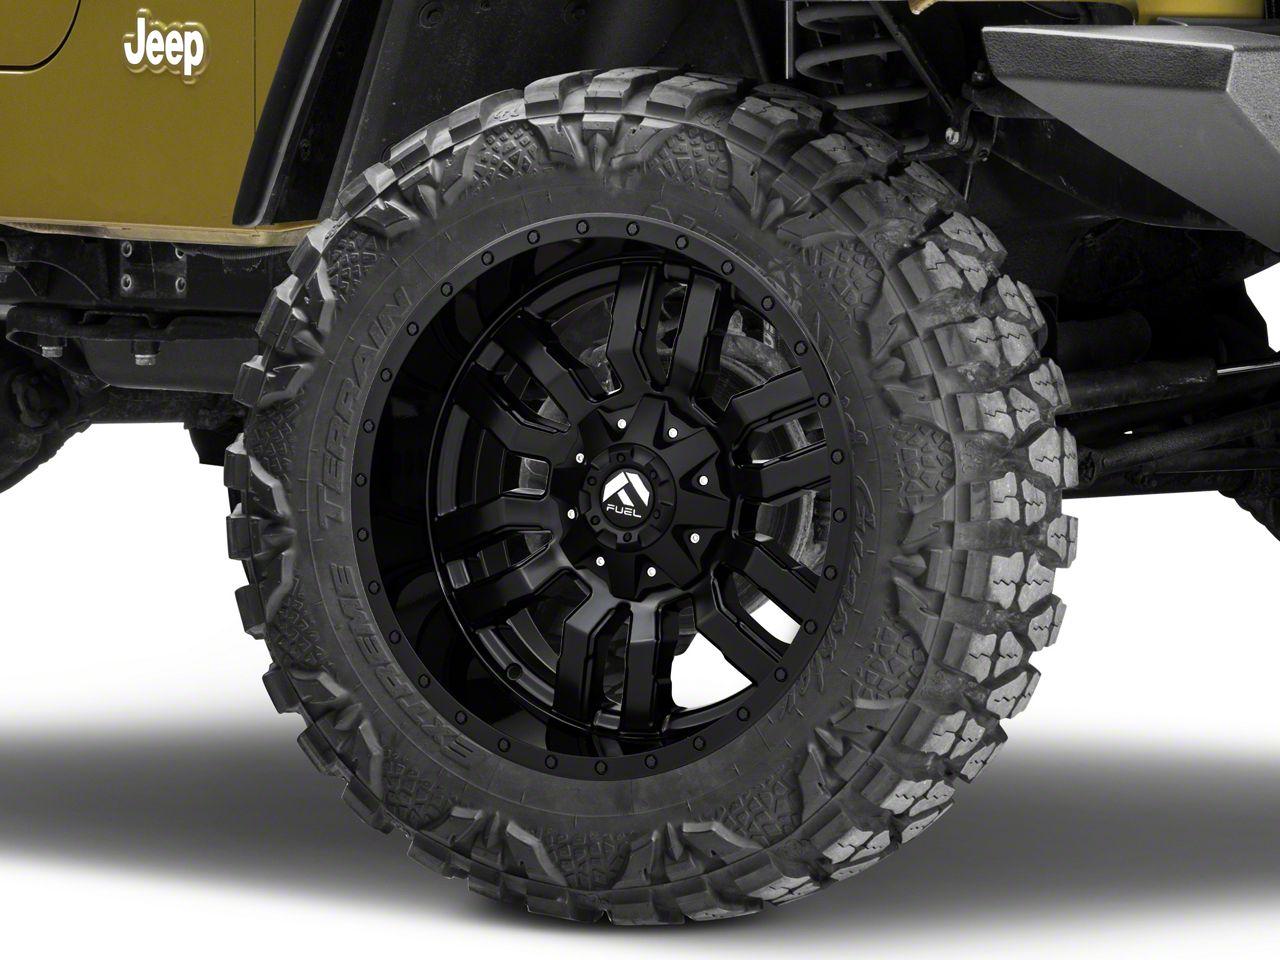 Fuel Wheels Sledge Matte Black Wheel - 20x10 (87-06 Jeep Wrangler YJ & TJ)